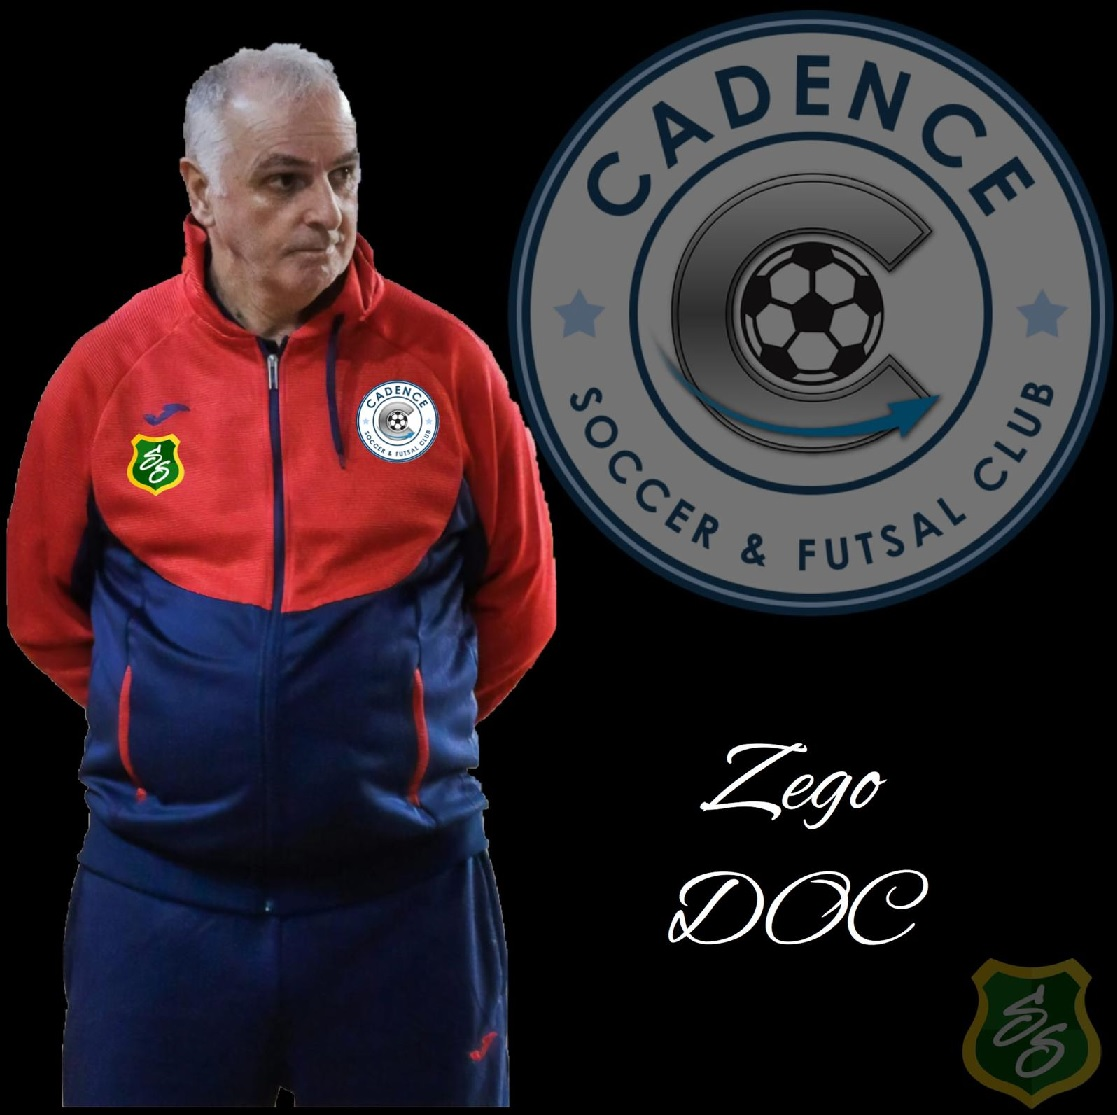 Legendary futsal coach discusses his life in futsal with Futsal Focus